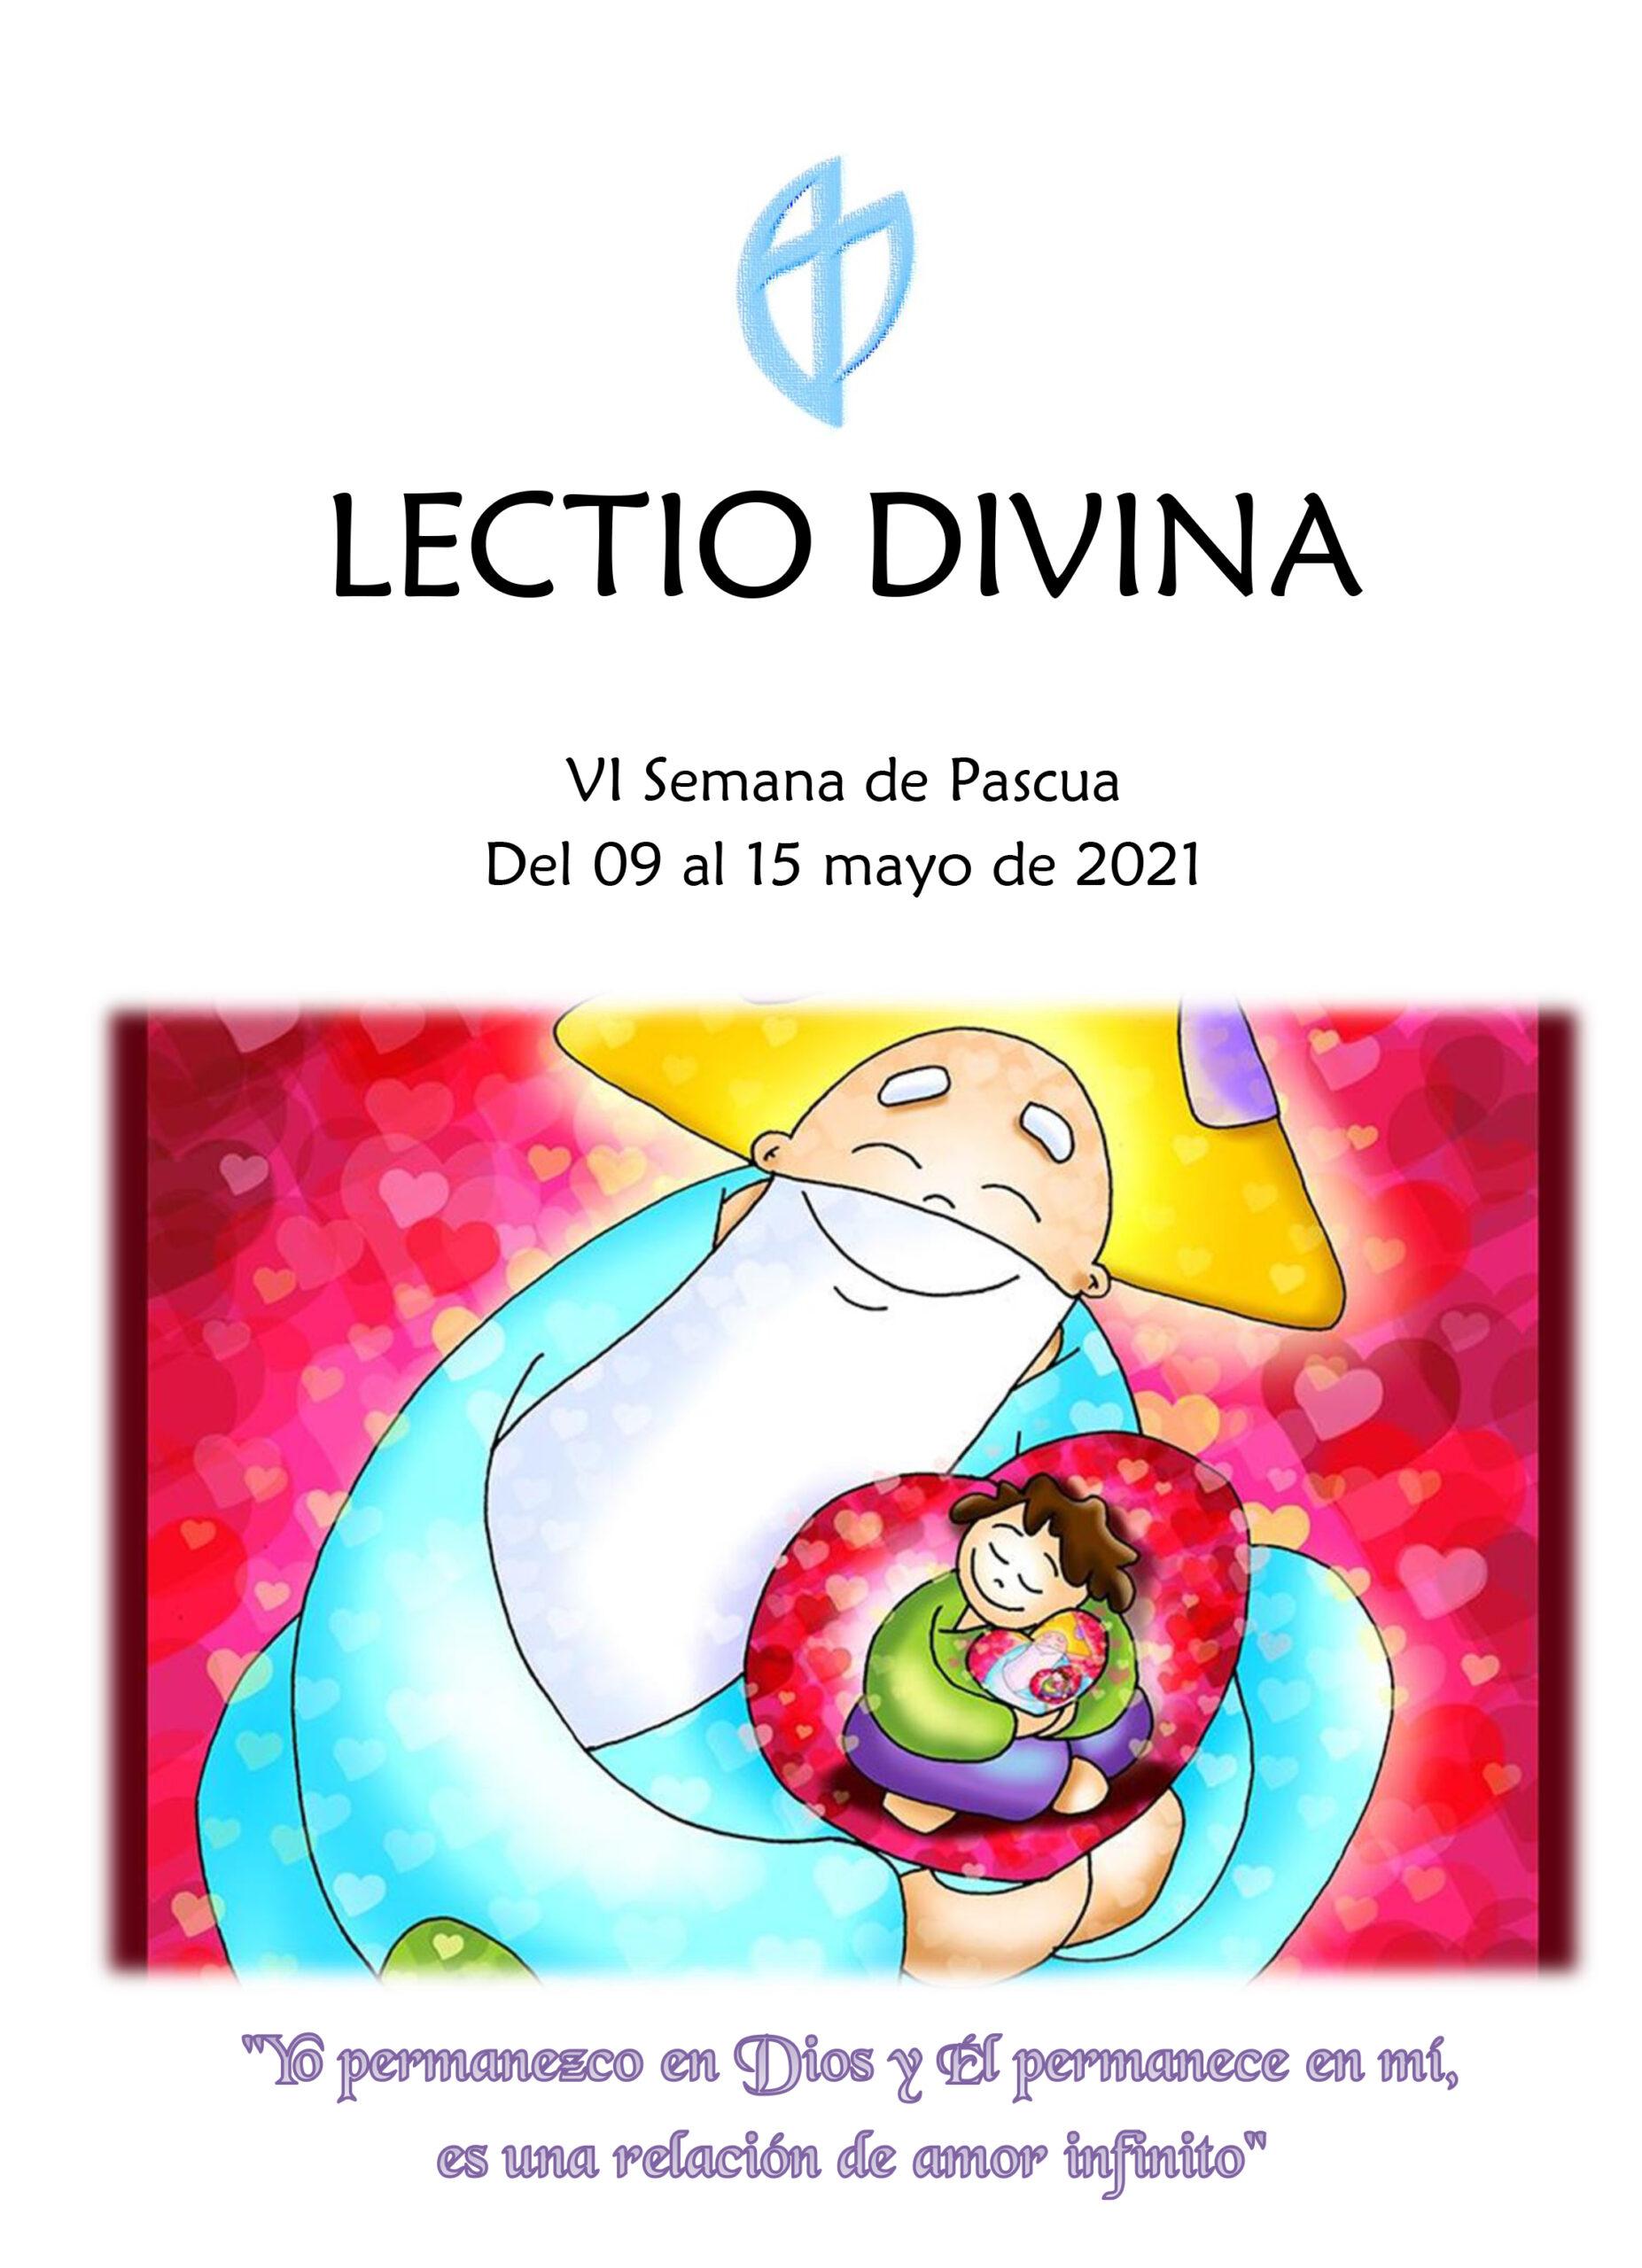 VI Semana de Pascua (del 09 al 15 mayo de 2021)